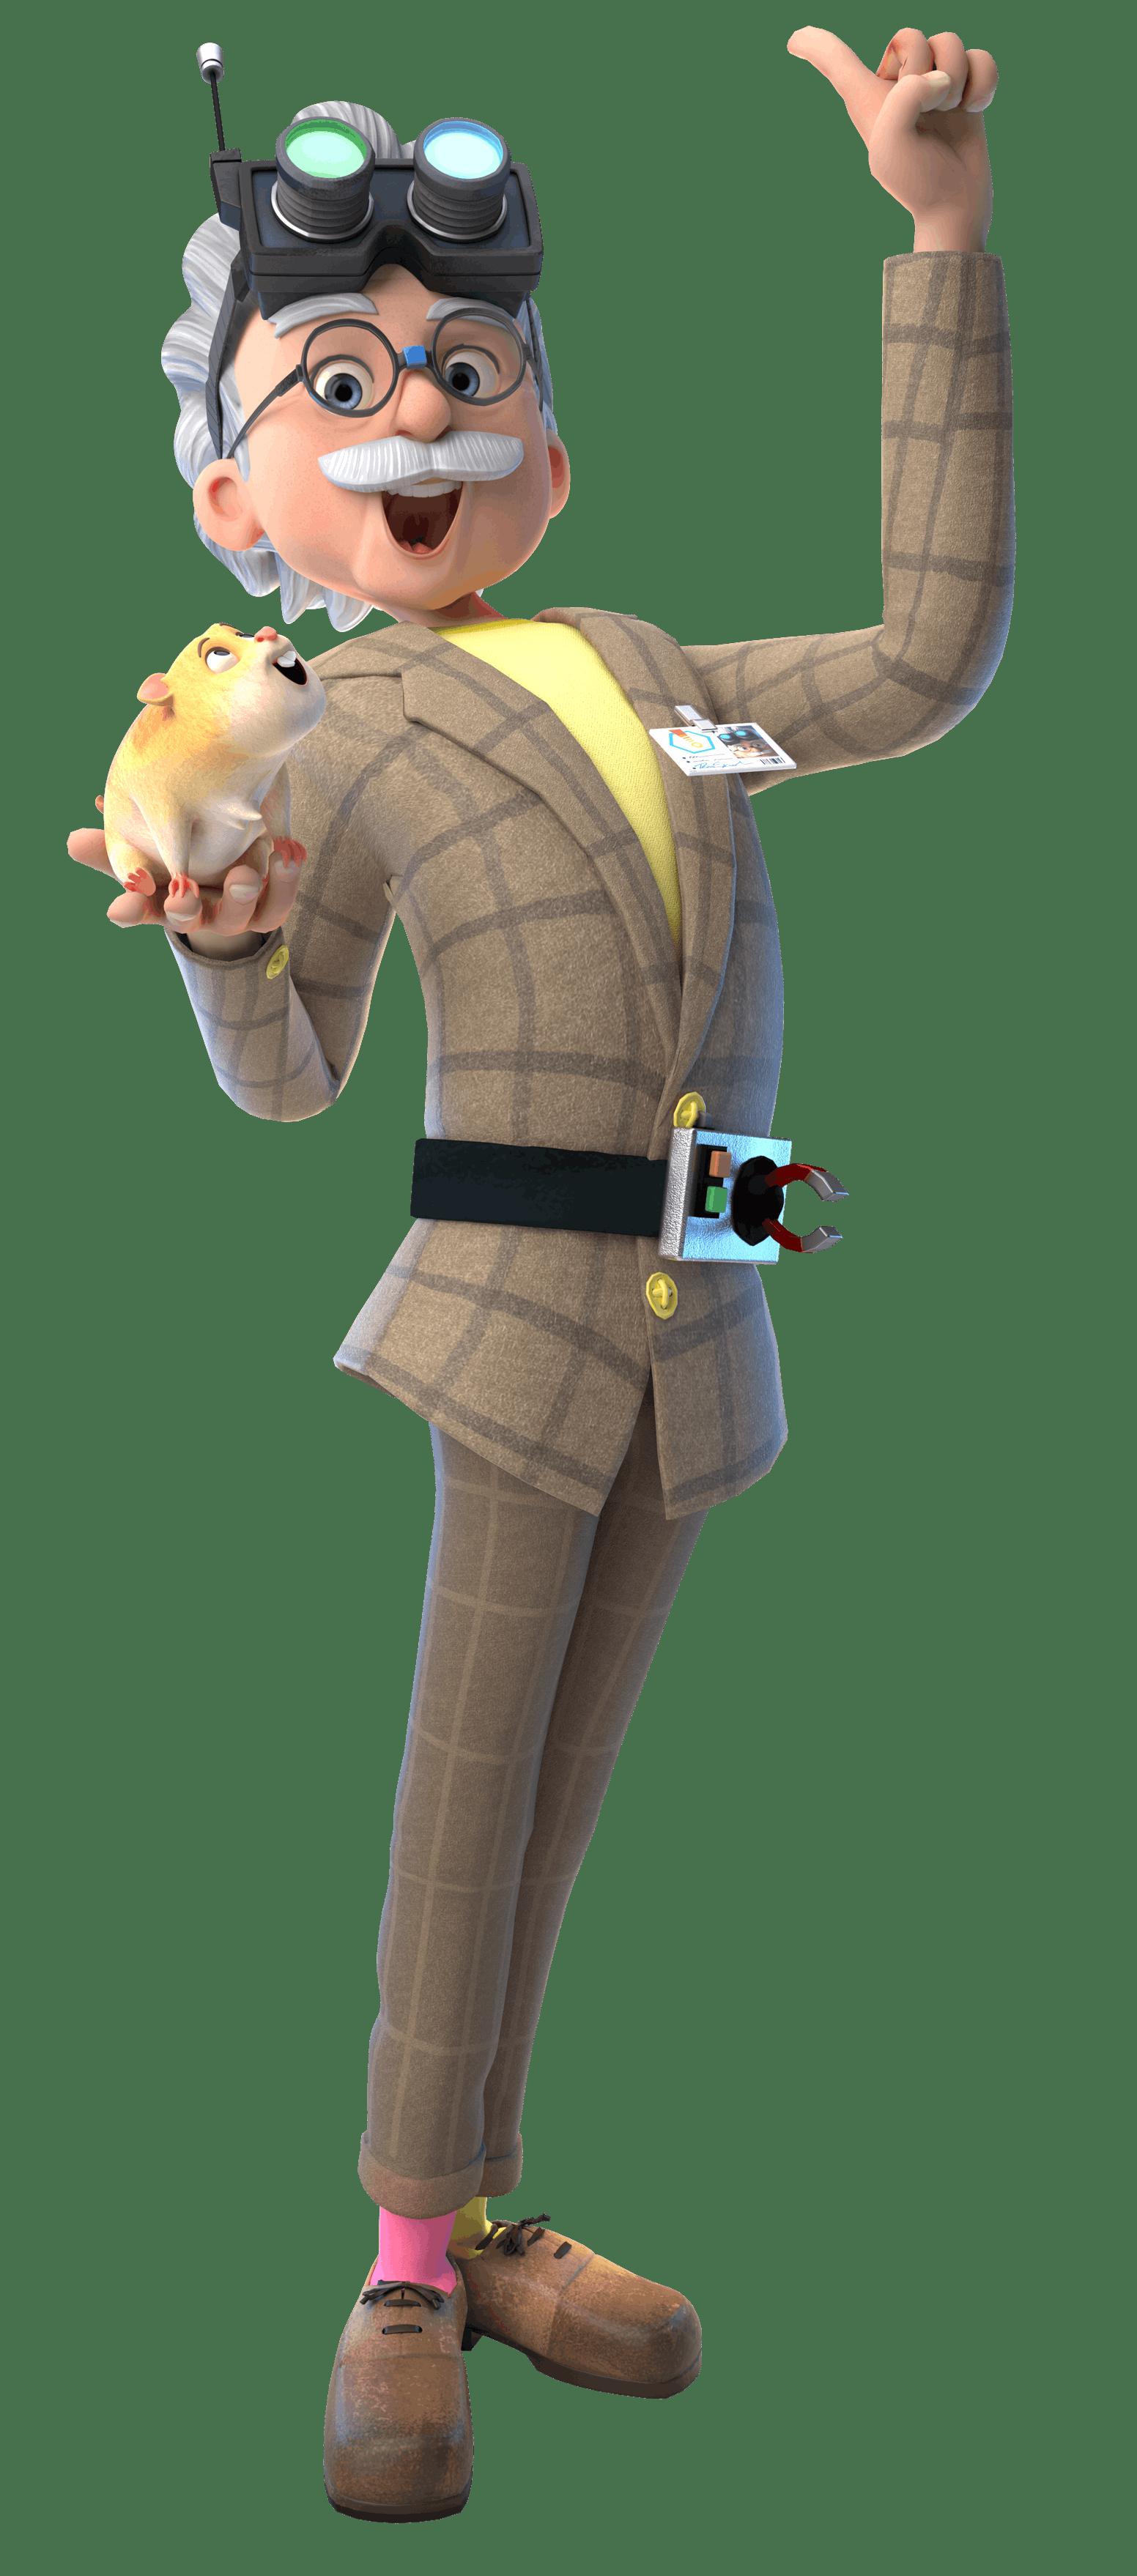 Professor Von Screwtop from the 2017 TV animation series, Dennis & Gnasher: Unleashed!